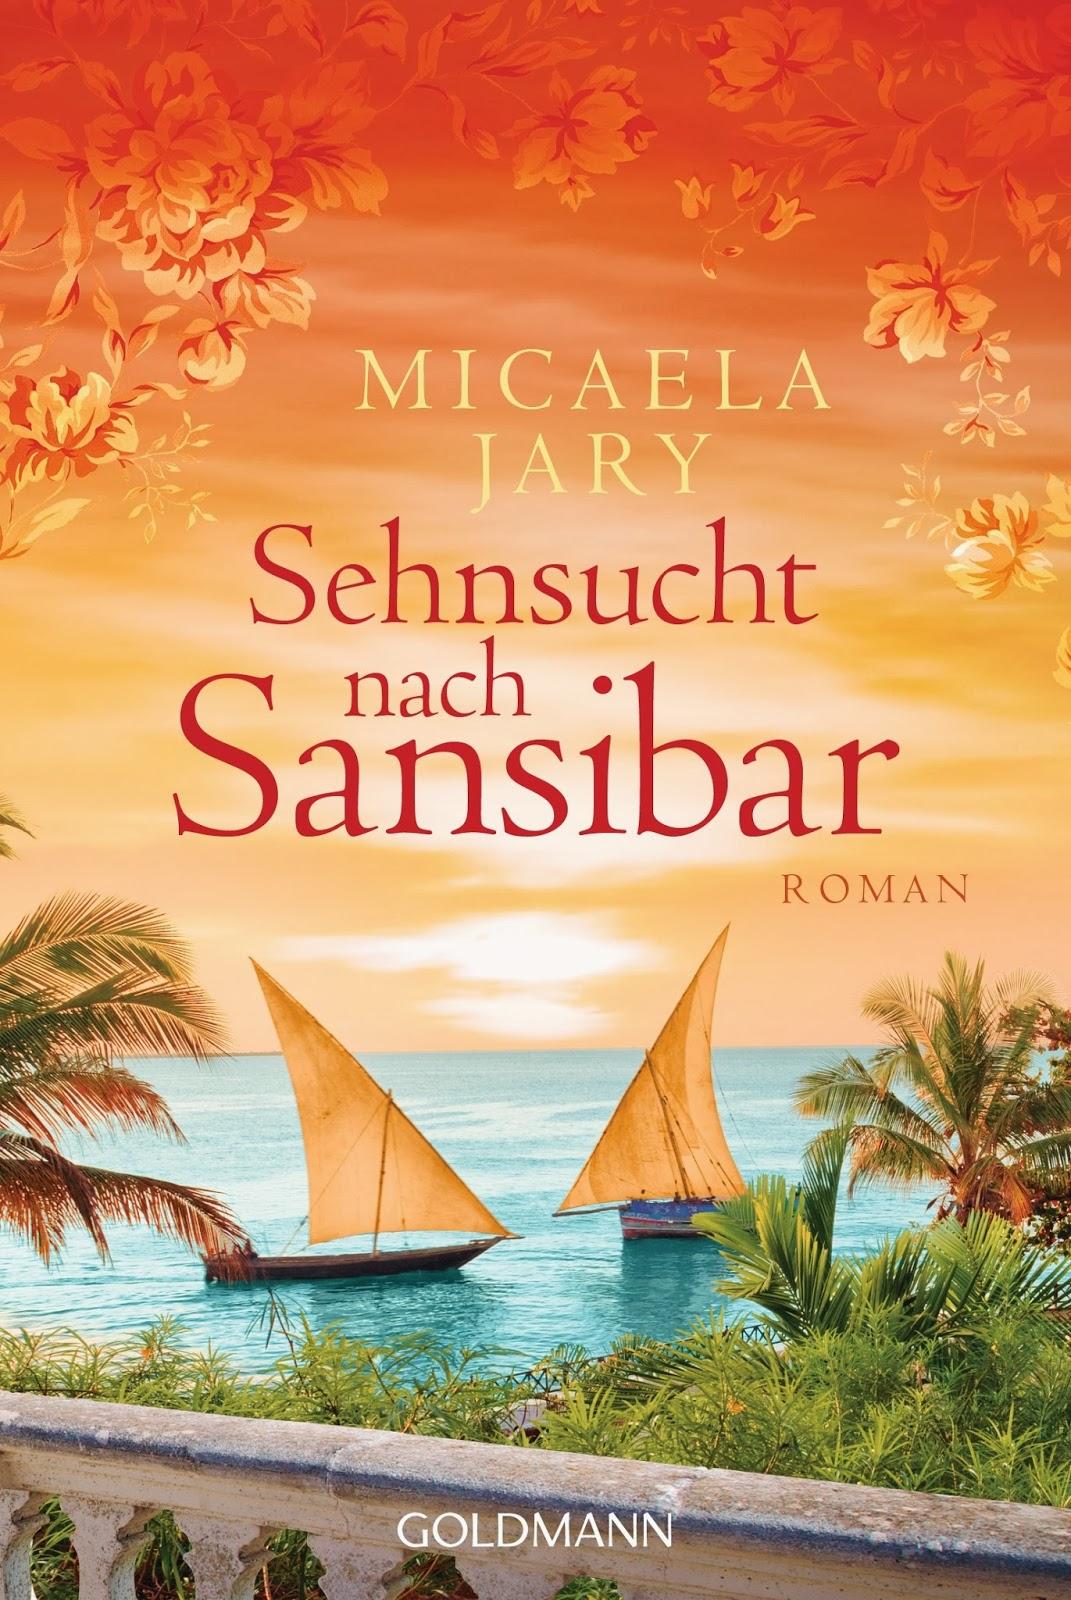 http://www.randomhouse.de/Taschenbuch/Sehnsucht-nach-Sansibar-Roman/Micaela-Jary/e379214.rhd